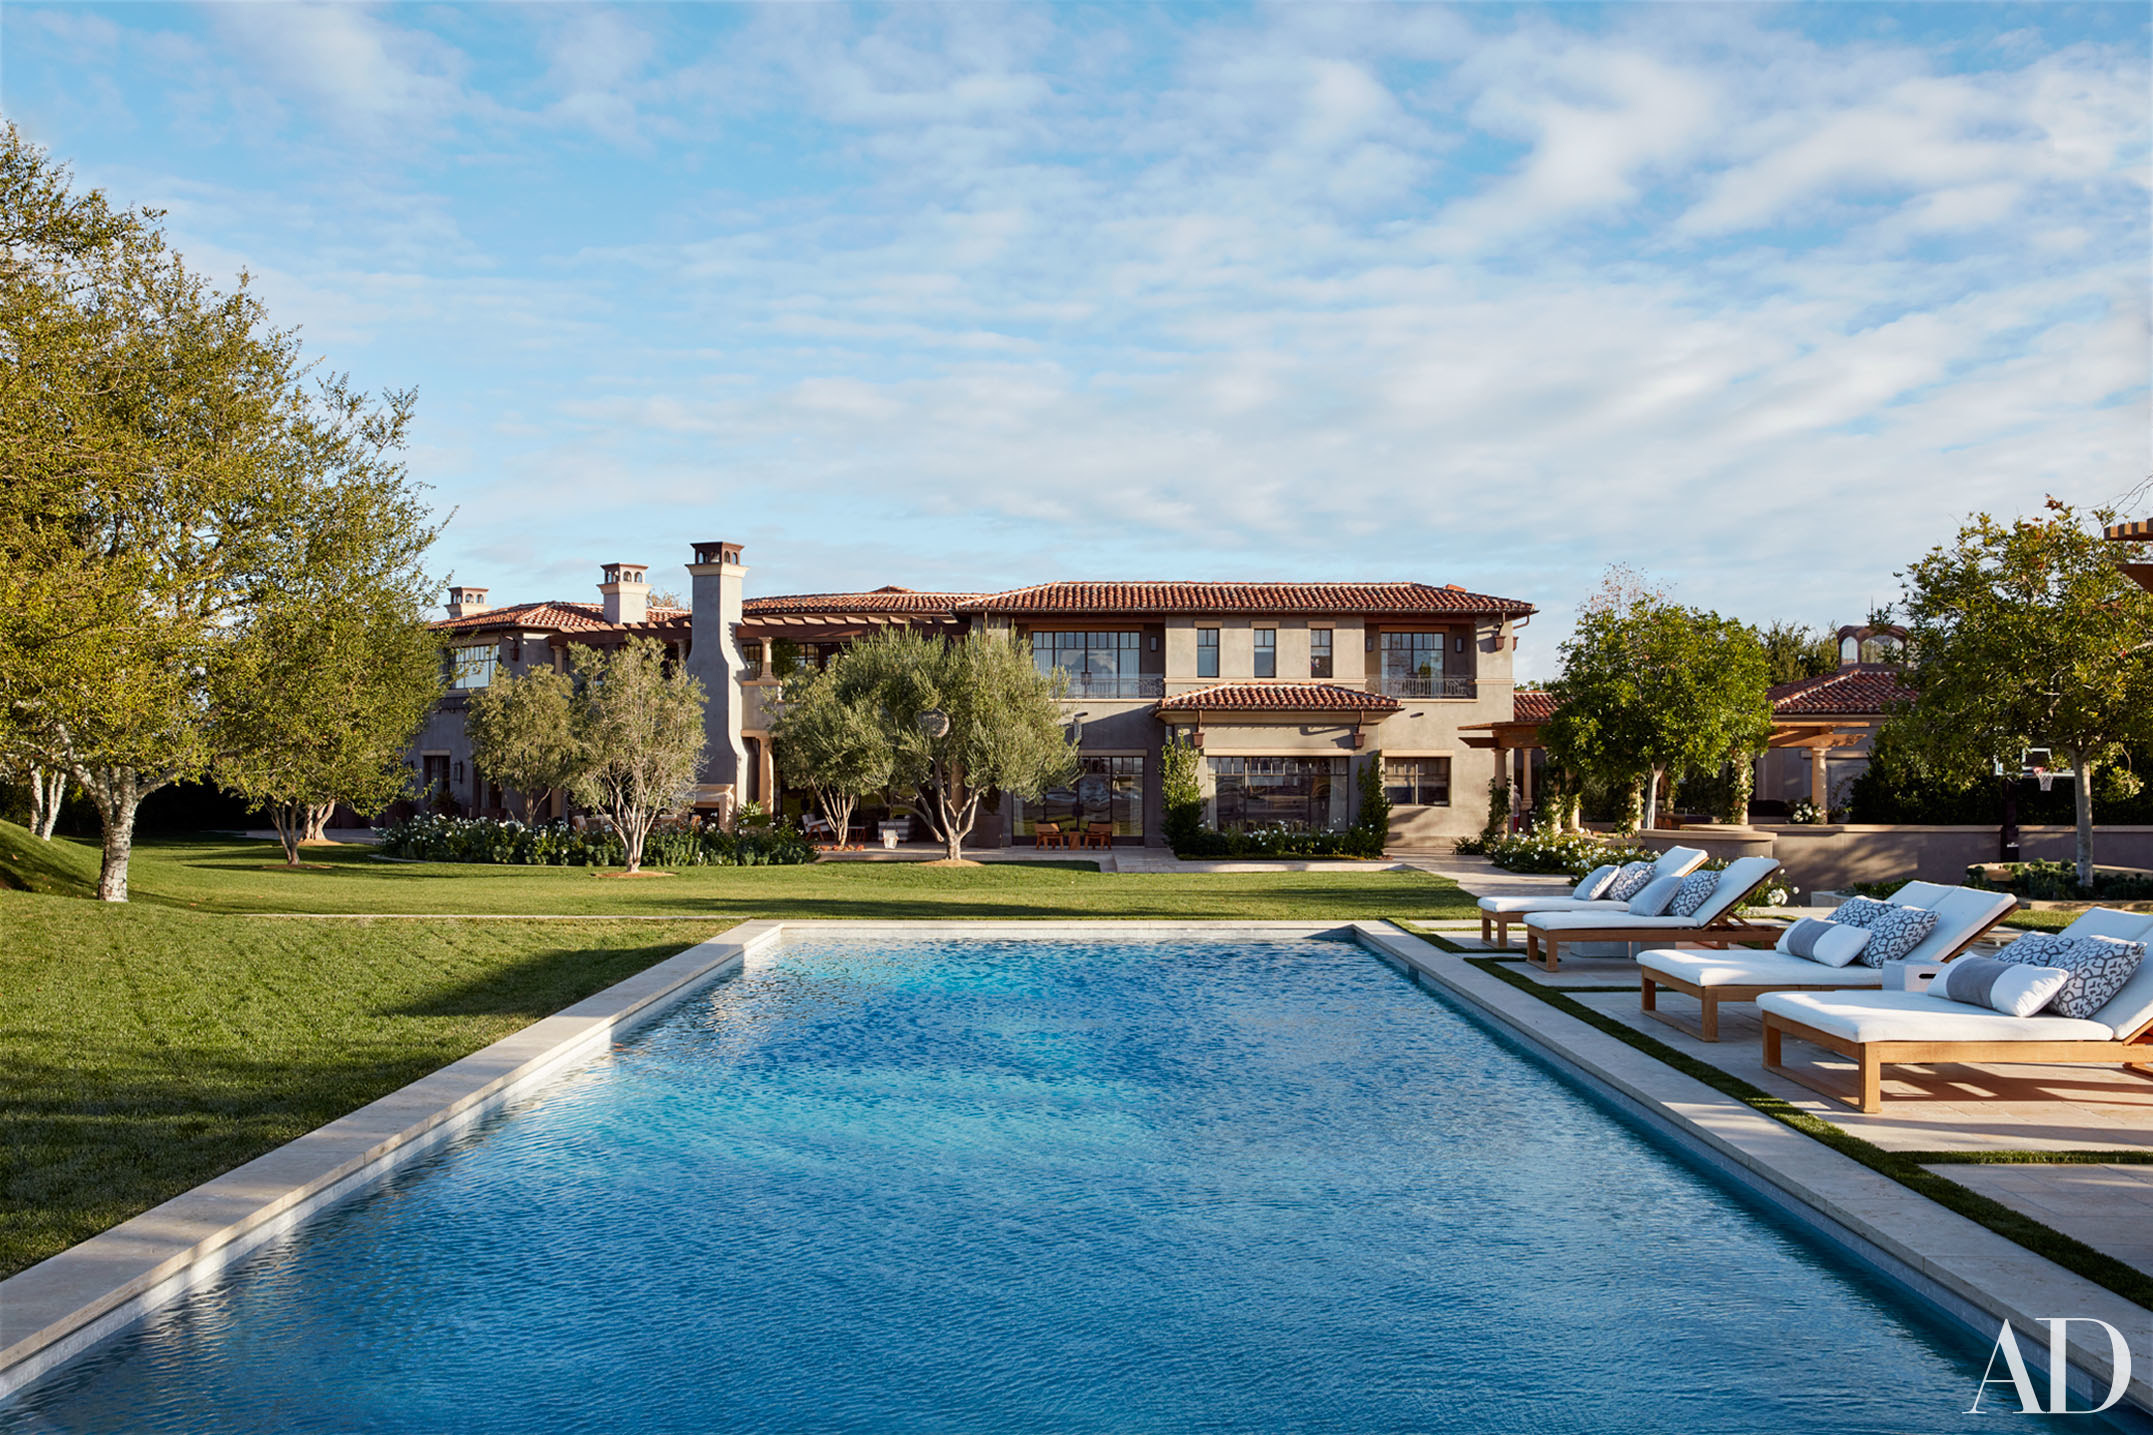 Visite priv e la maison de kourtney kardashian for New pool designs 2016